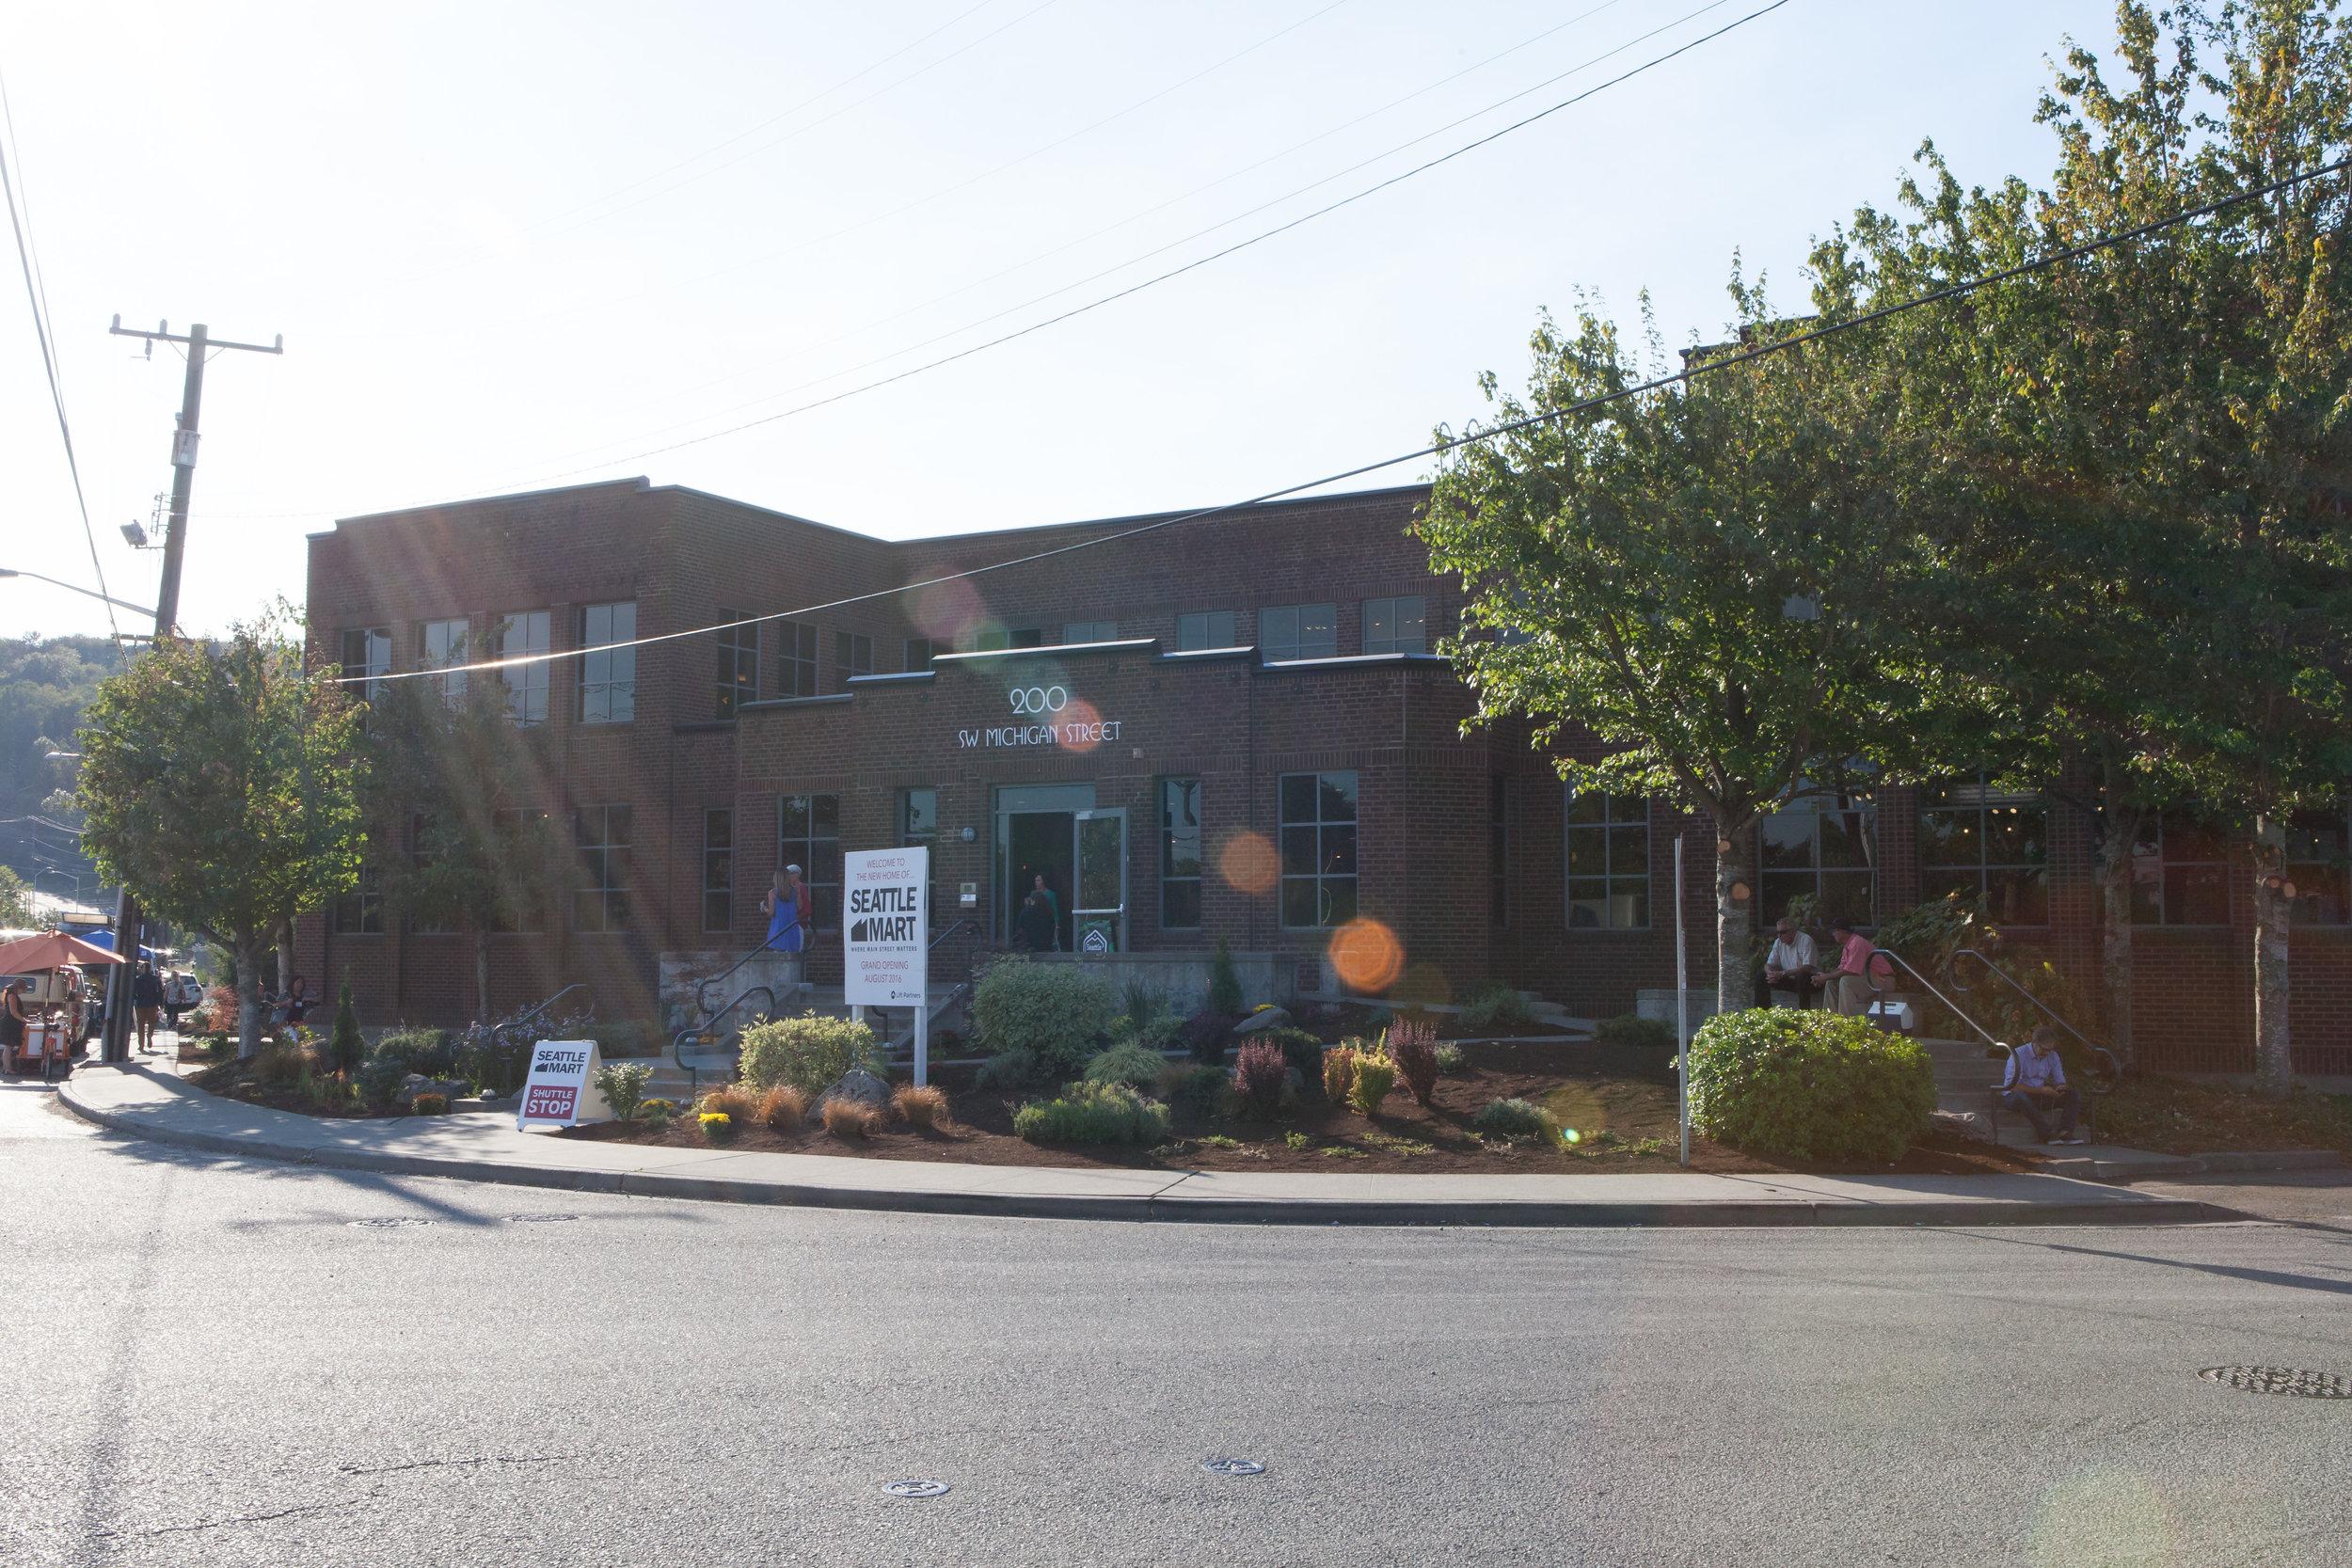 SeattleMart_GrandOpening_82016-102.jpg